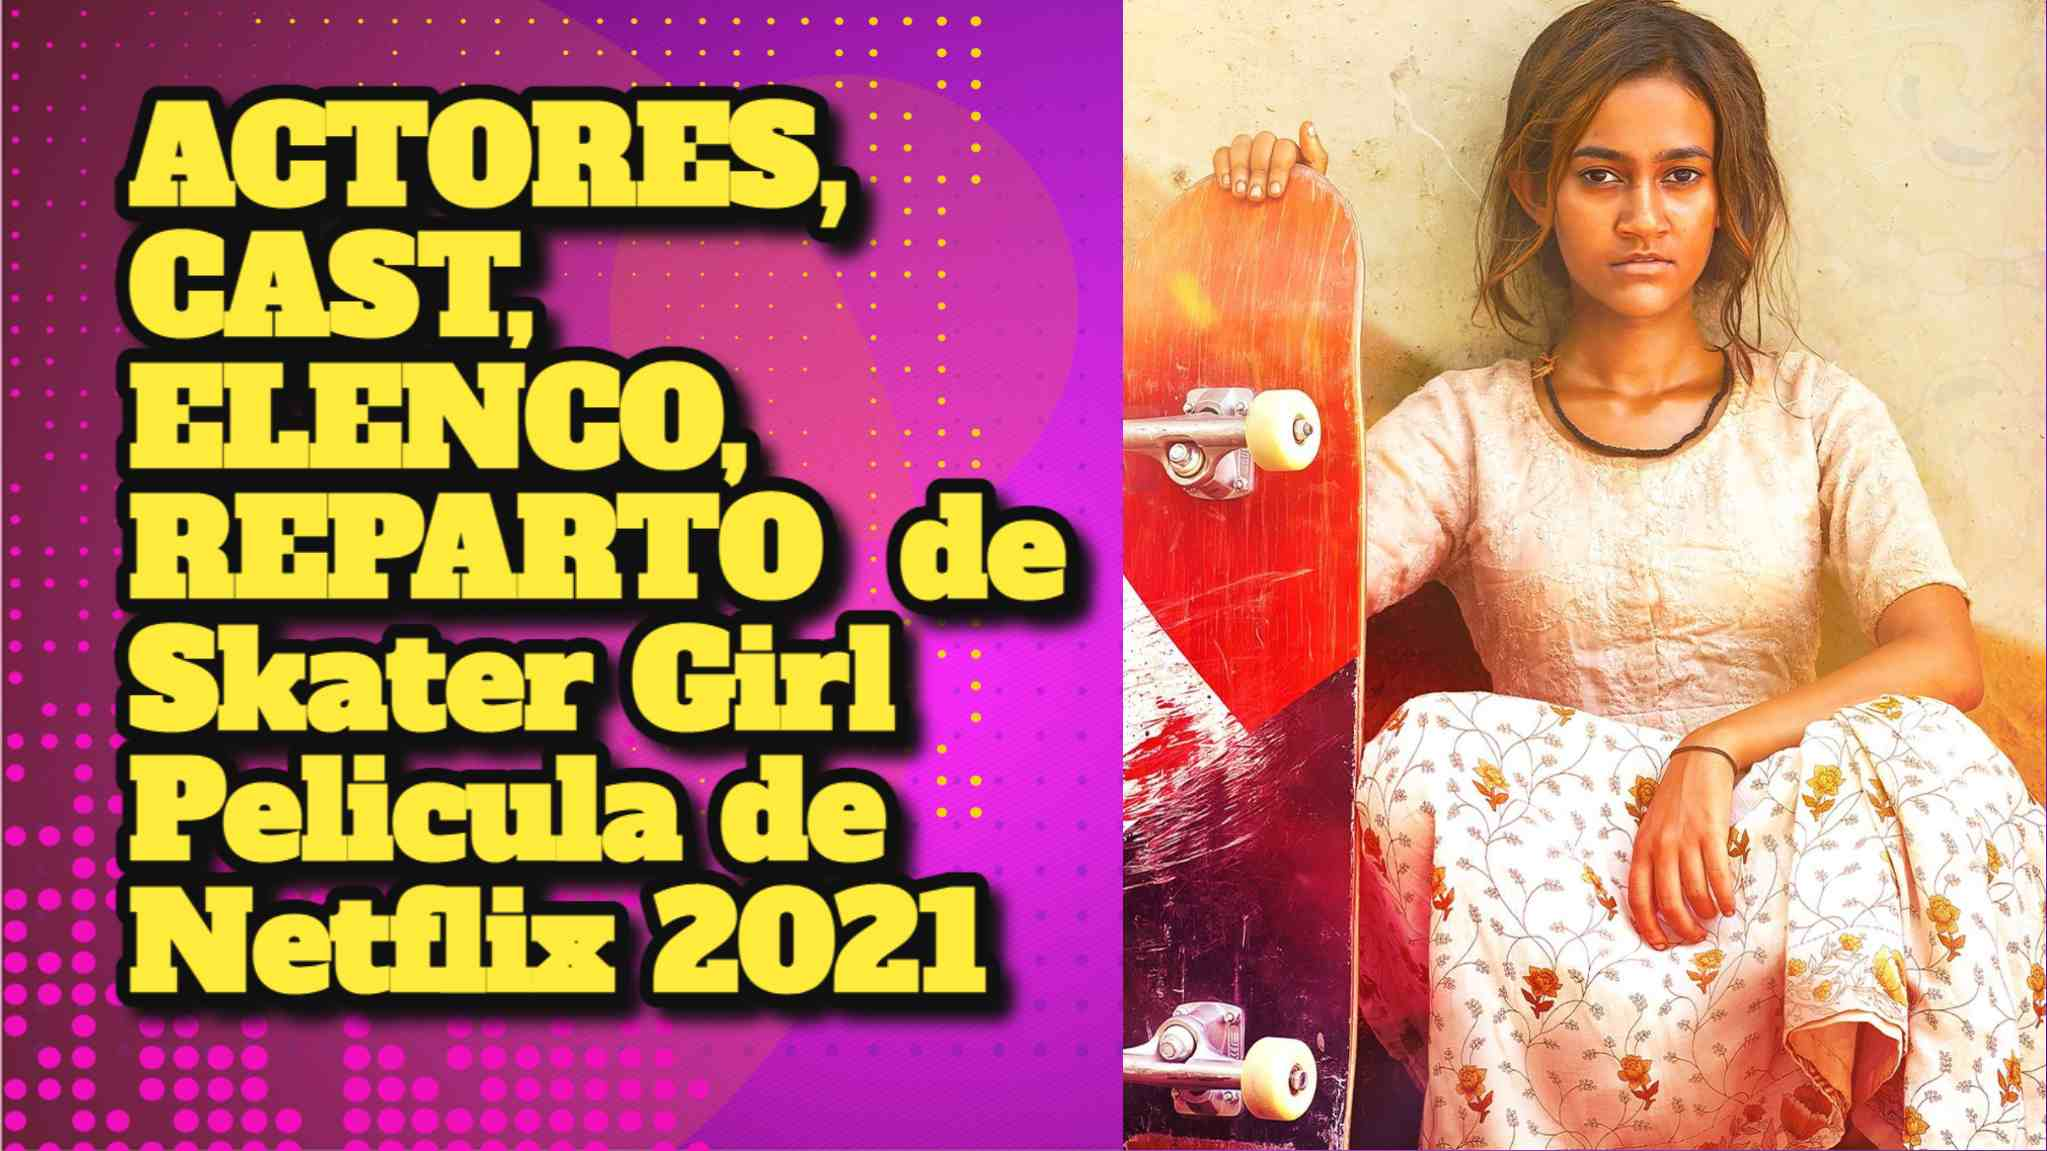 ACTORES, CAST, ELENCO, REPARTO de Skater Girl Pelicula de Netflix 2021